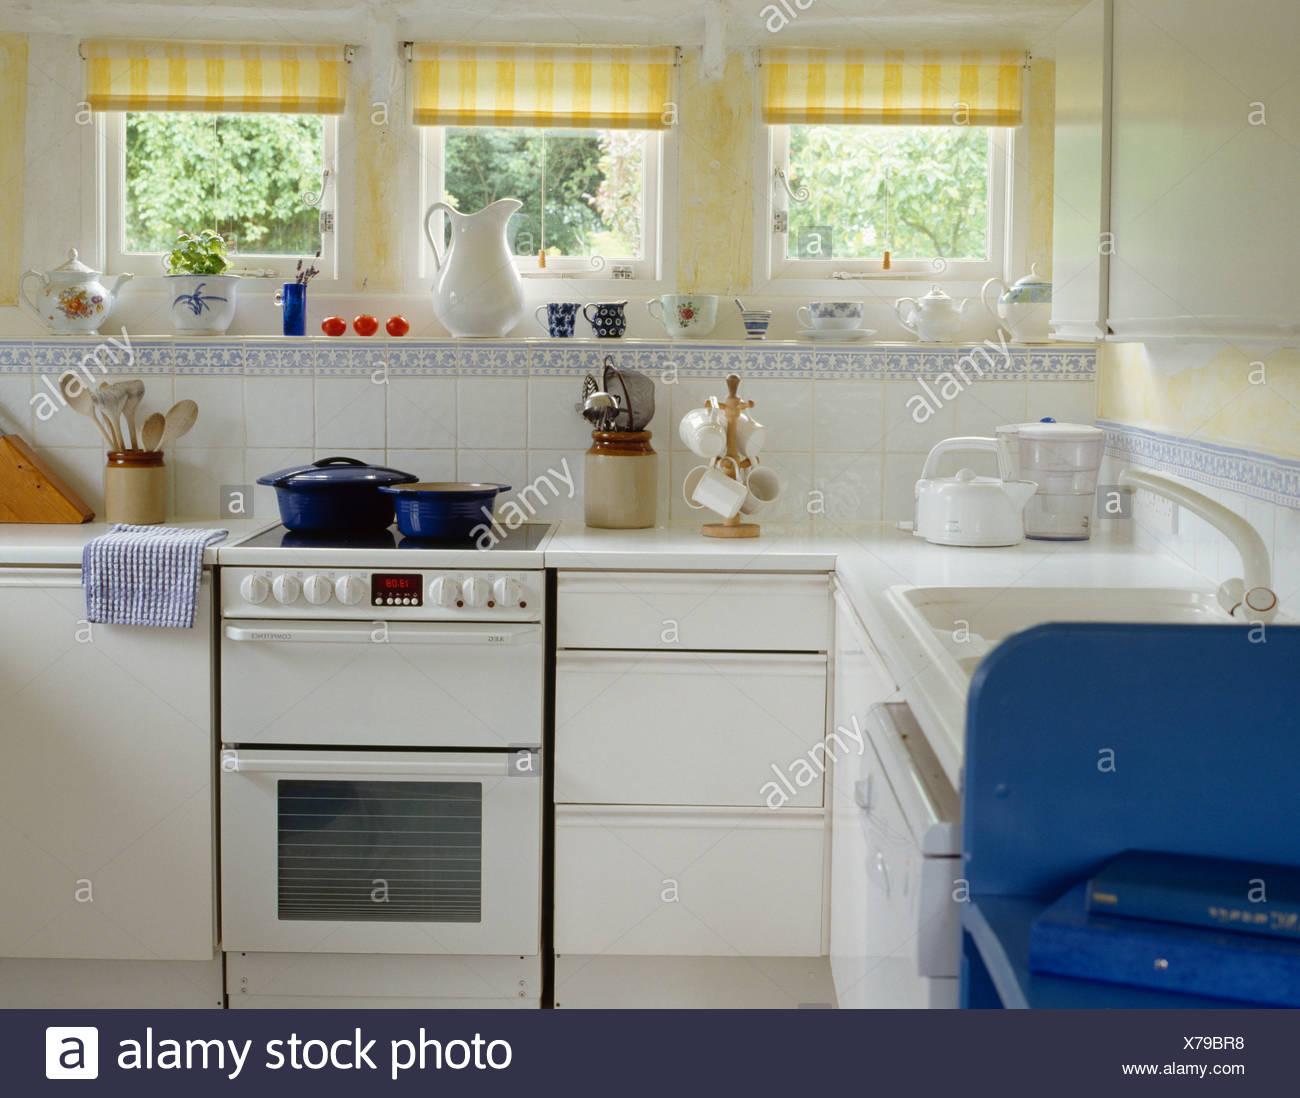 Encantador Mesa De Cocina Del País Composición - Ideas de Decoración ...